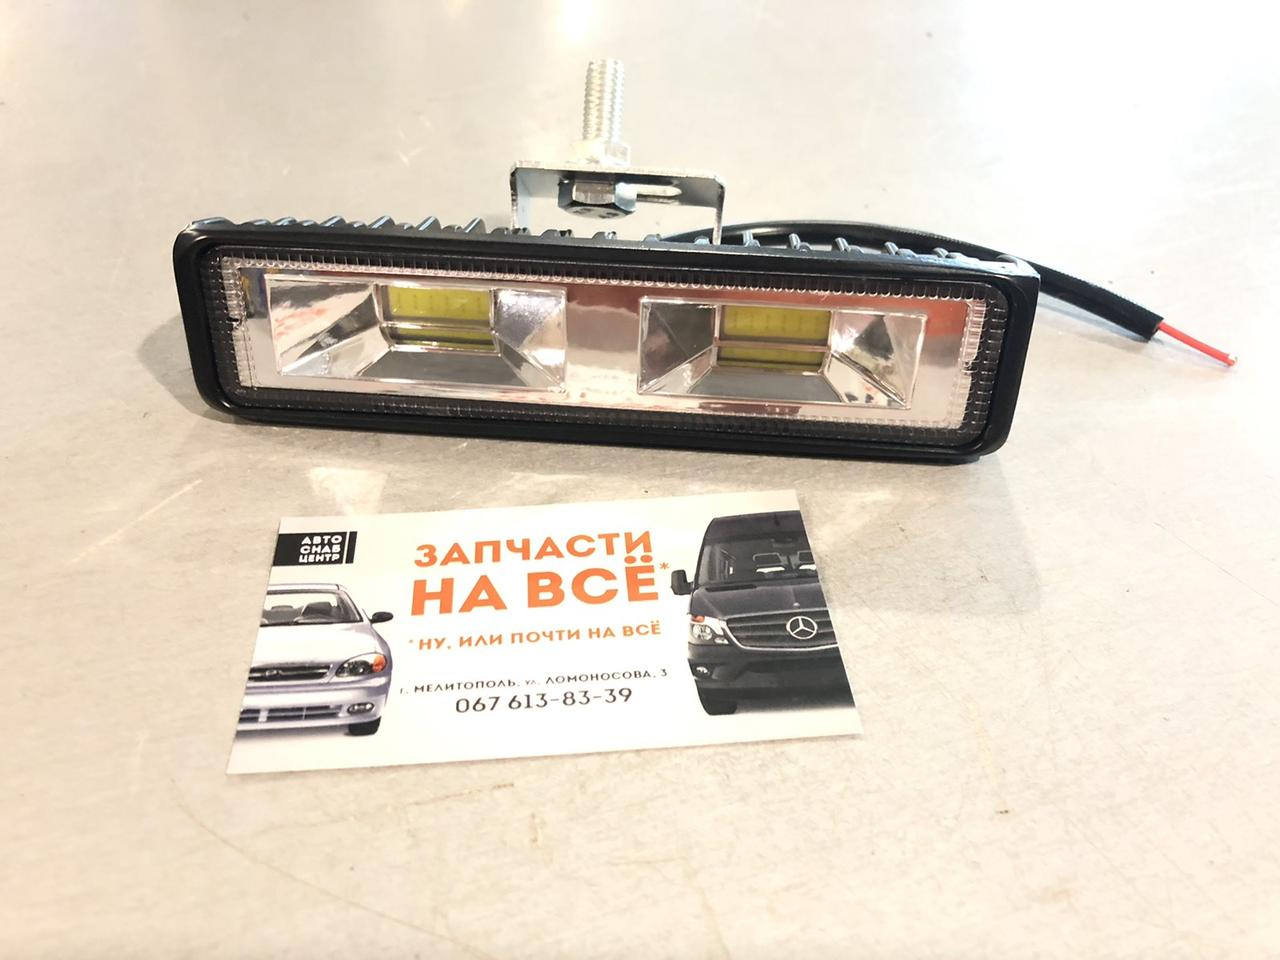 Фара LED прямоугольная 48W 6000K (2 диода) (15см х 4см х 2.5см) пластик   LED-6Inch-COB-48W-ABS